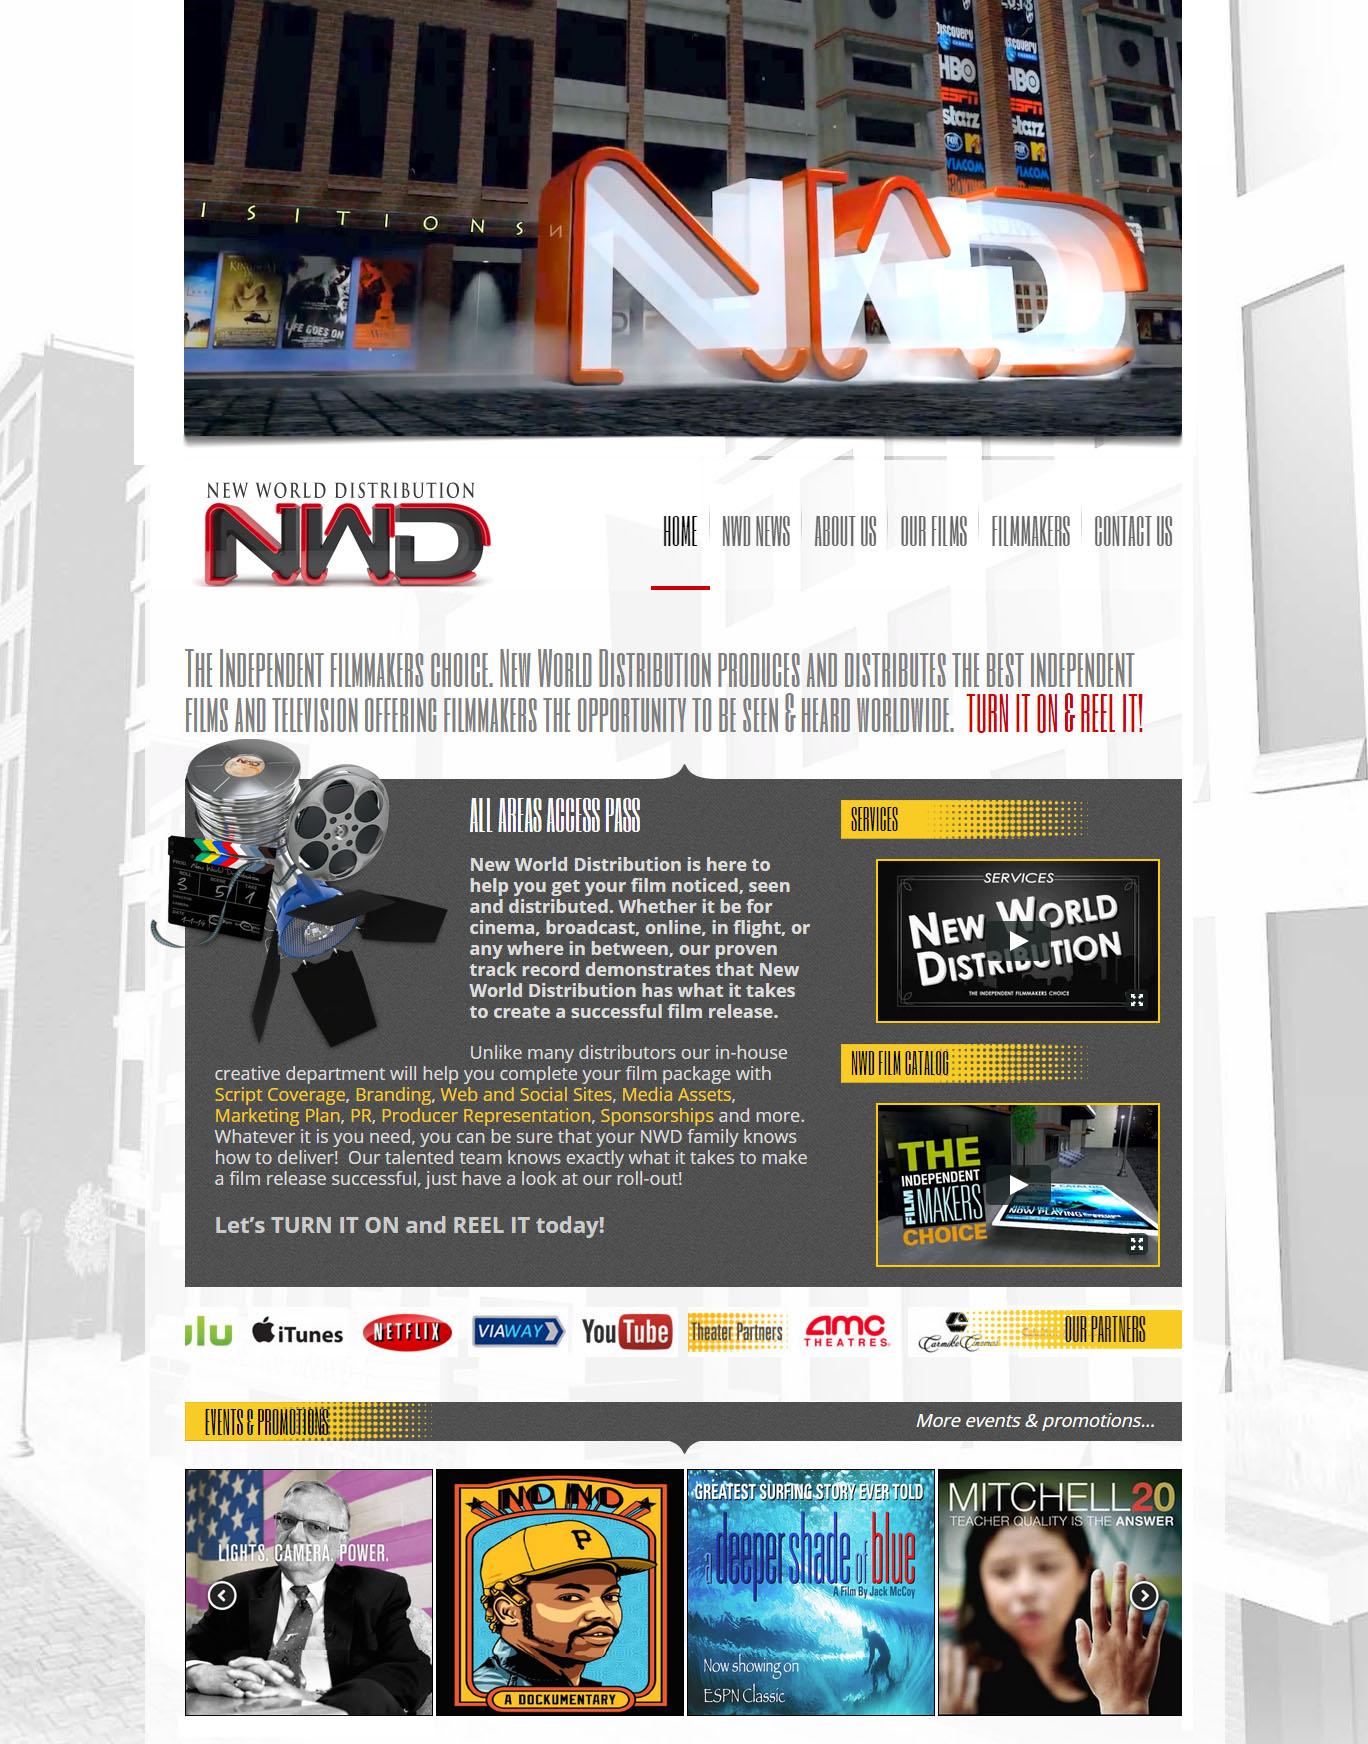 New World Distribution website design